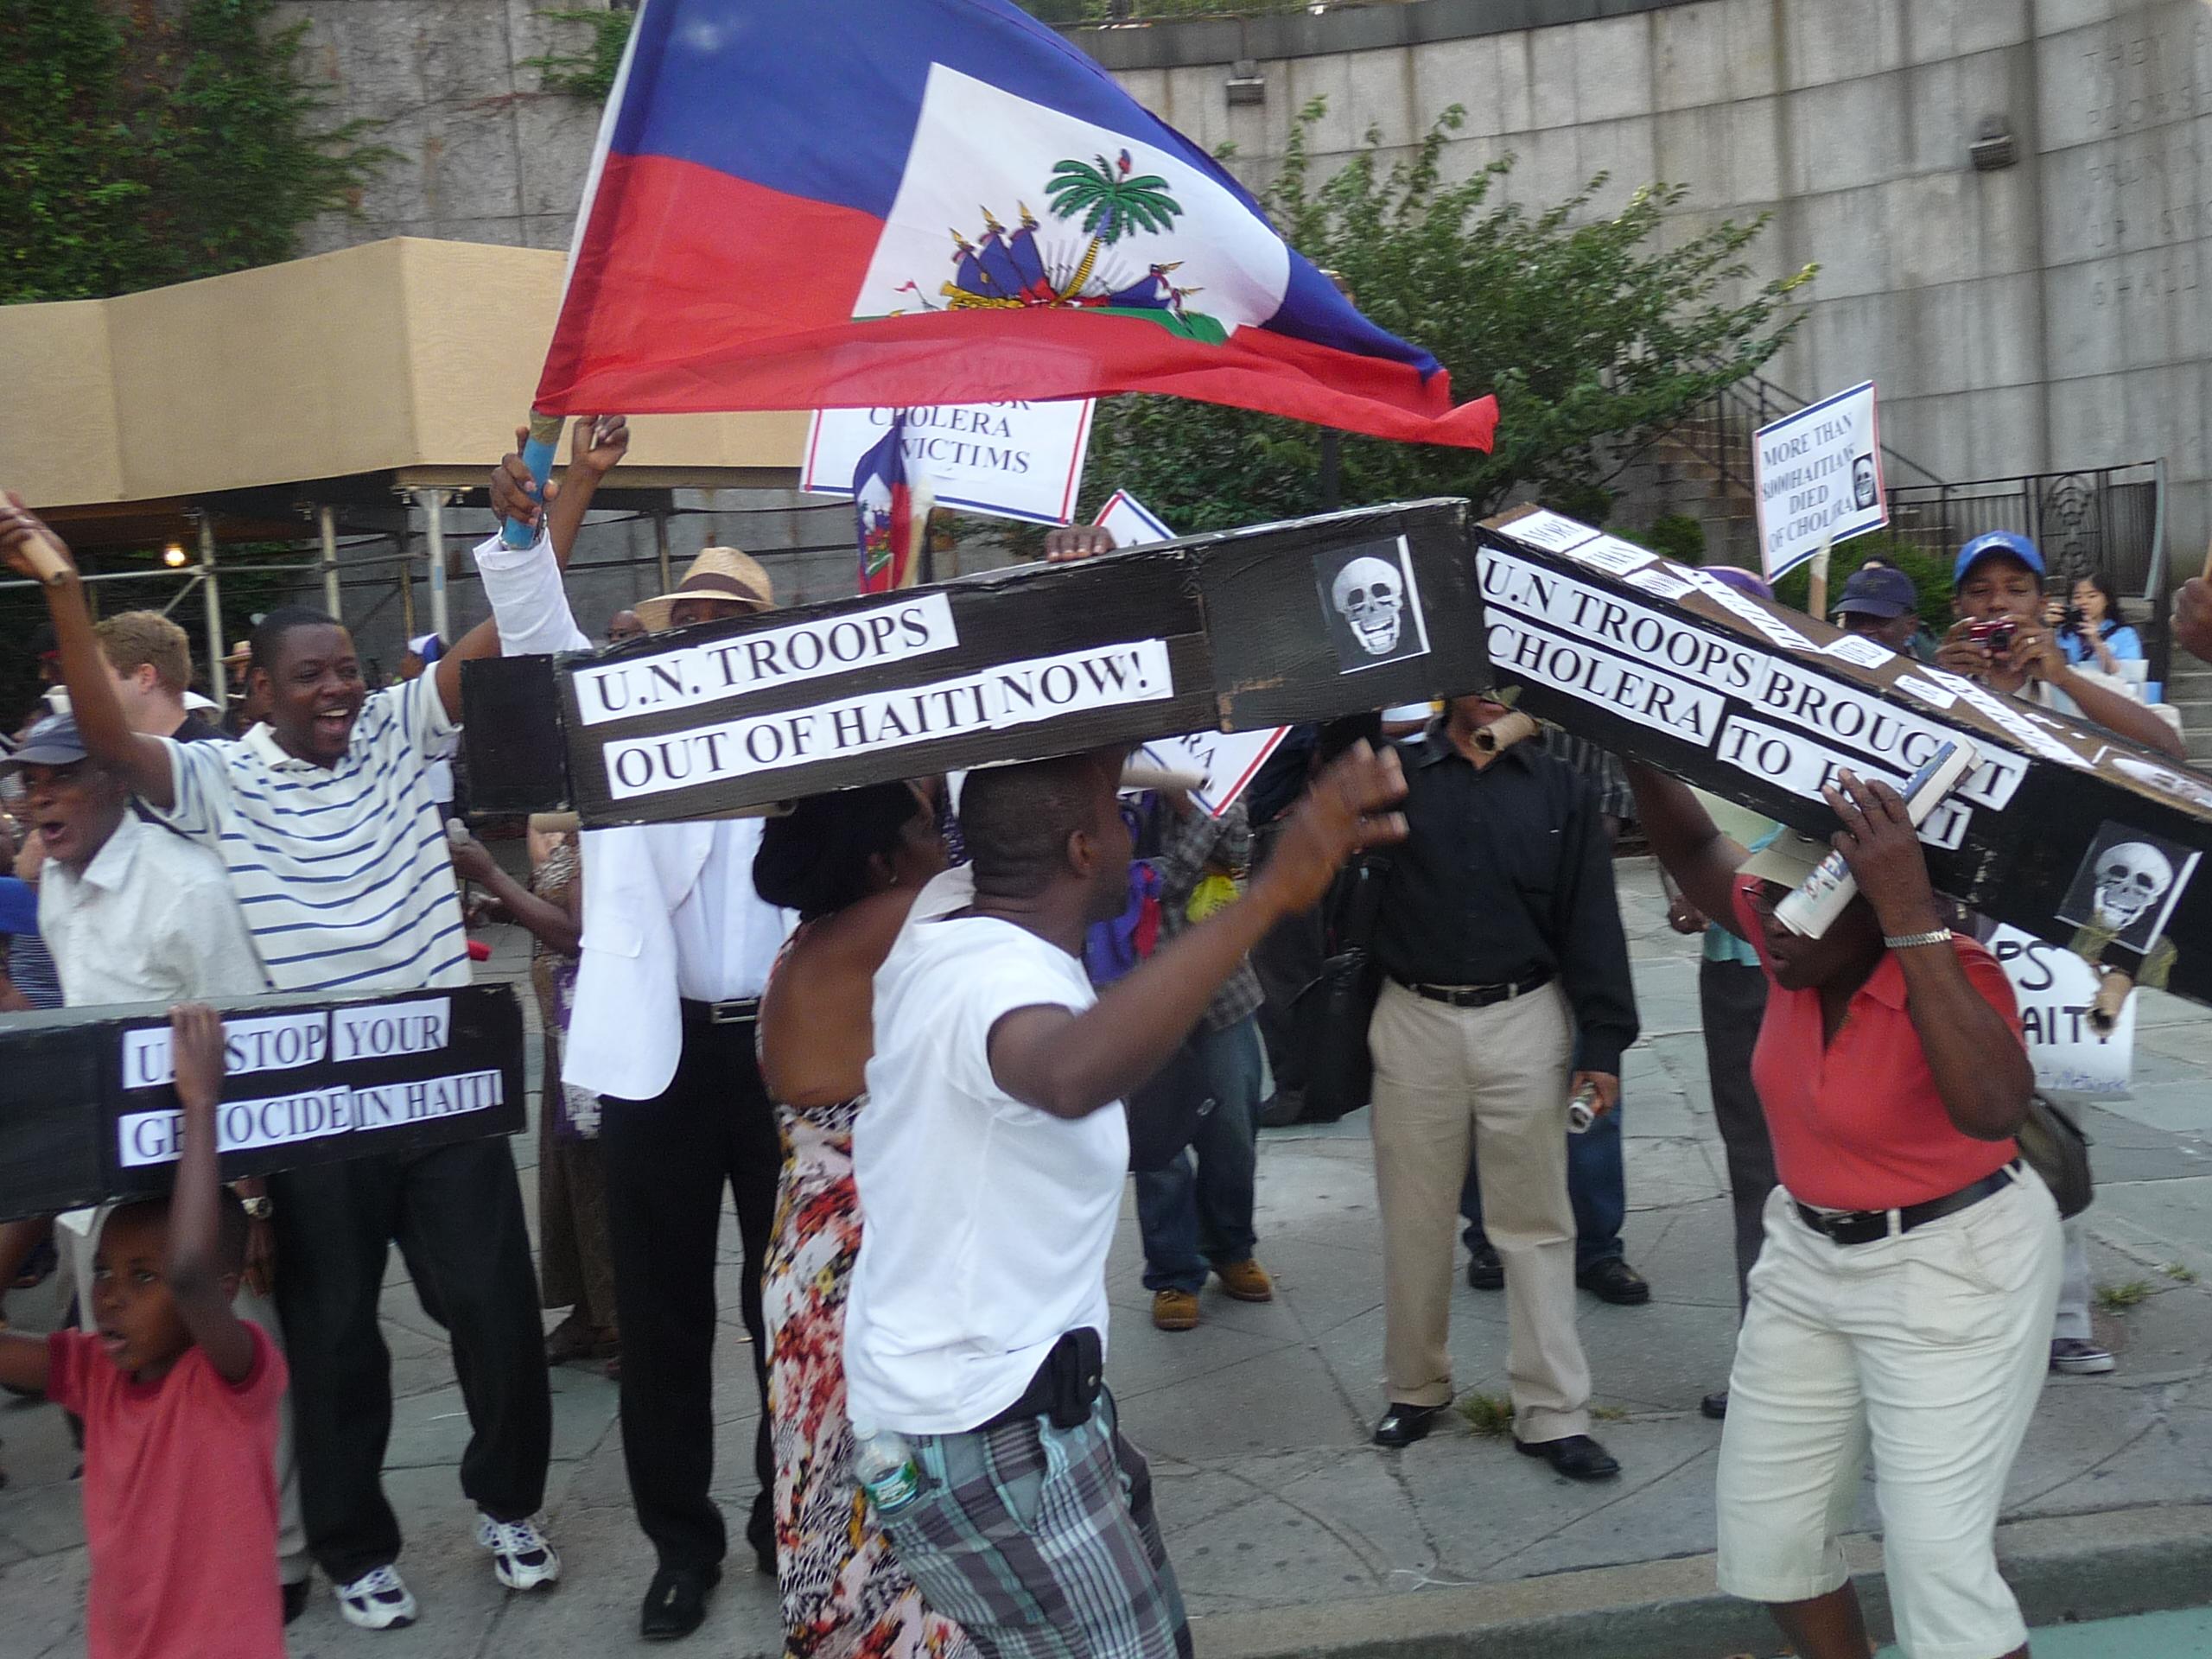 20110805_demo-against-un-occupation-cholera-in-haiti_05